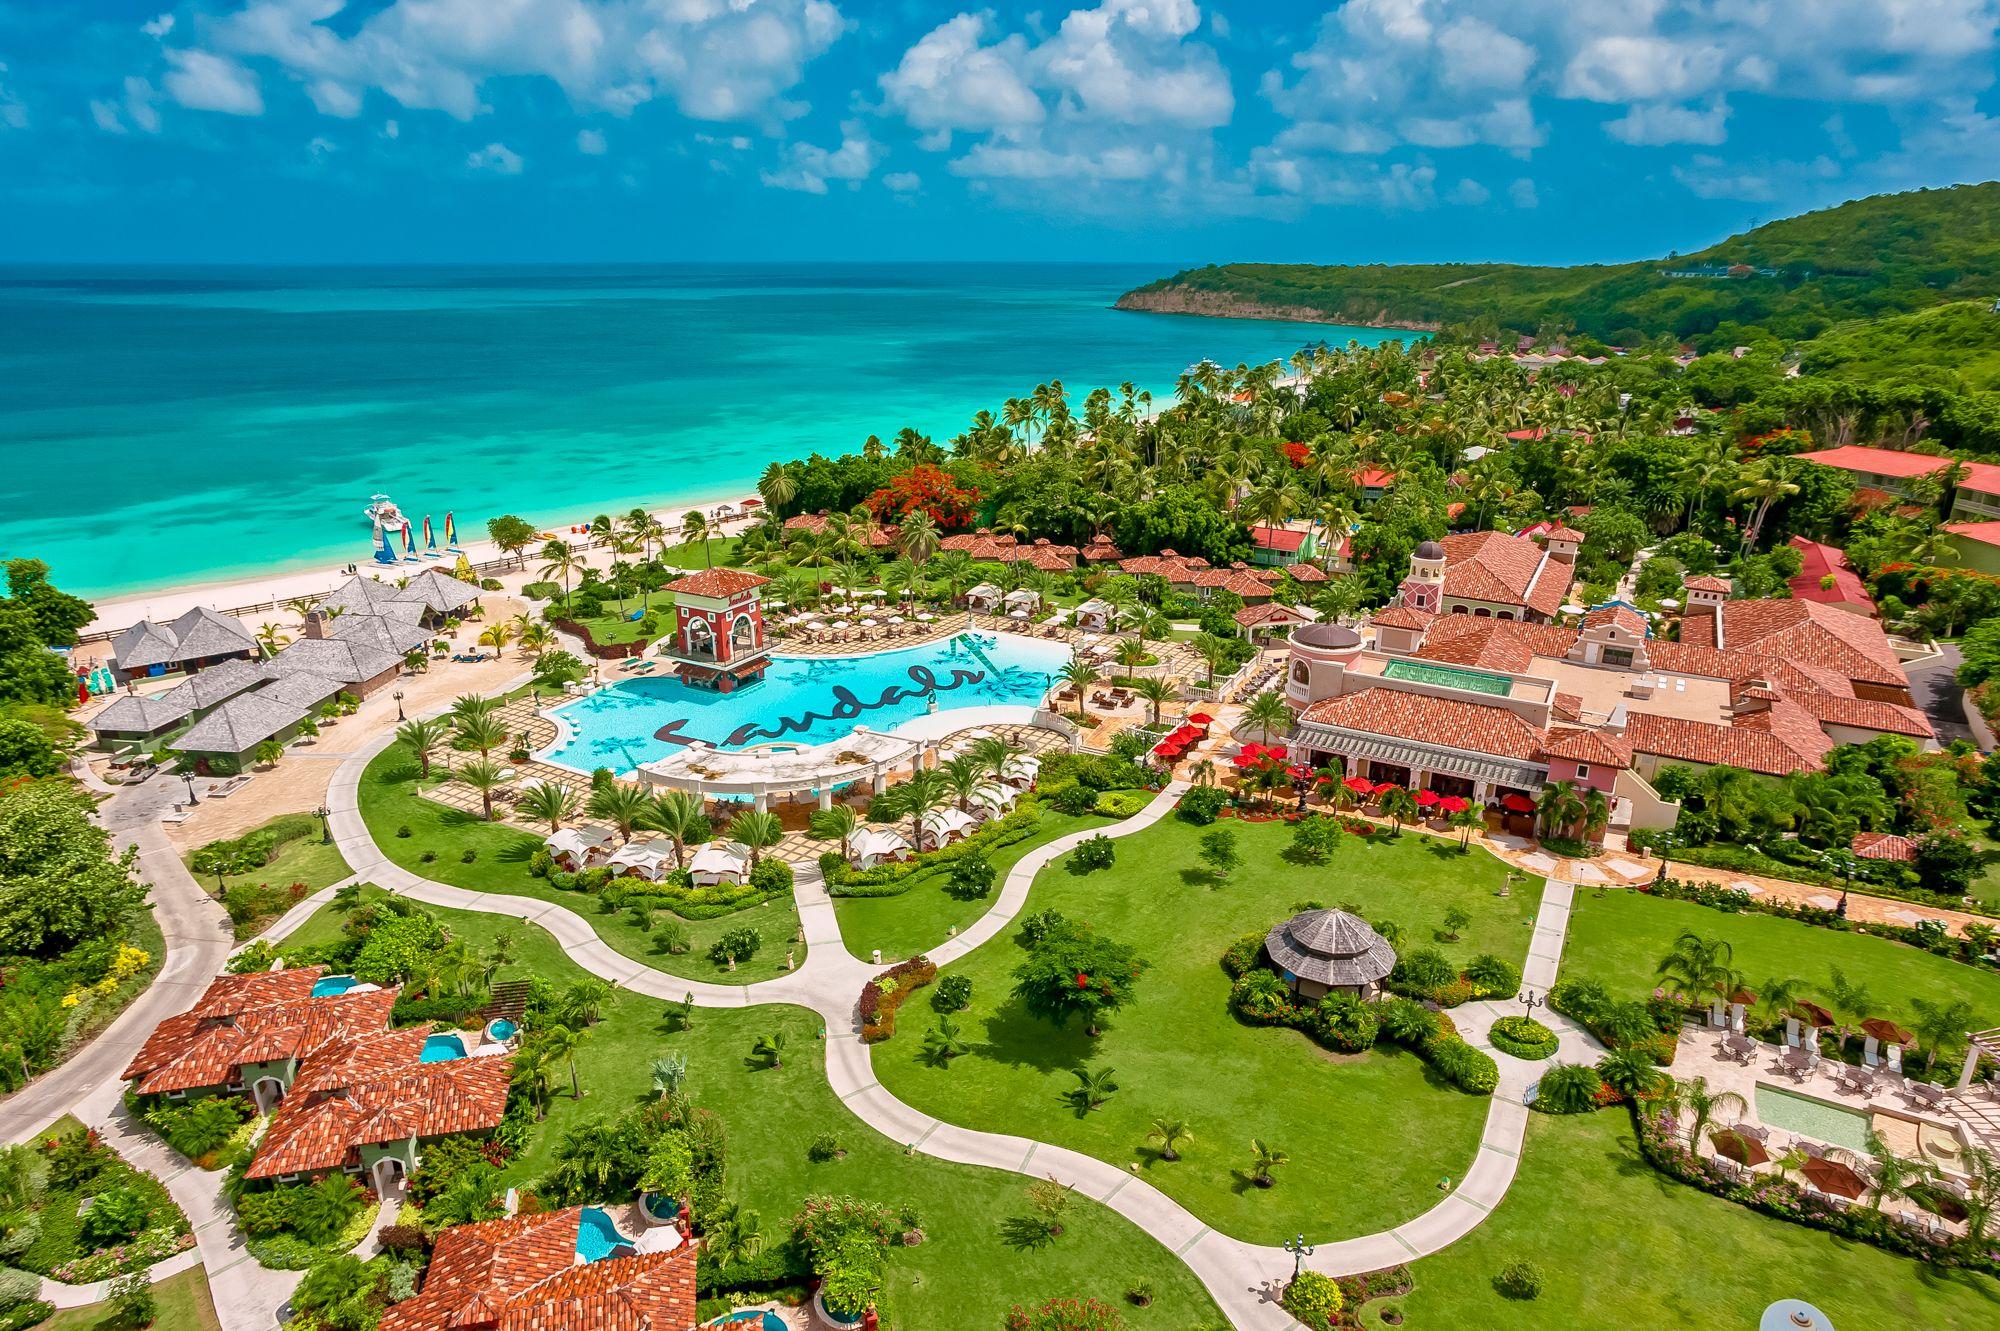 Sun, Sand and Social Distancing at Sandals Resorts